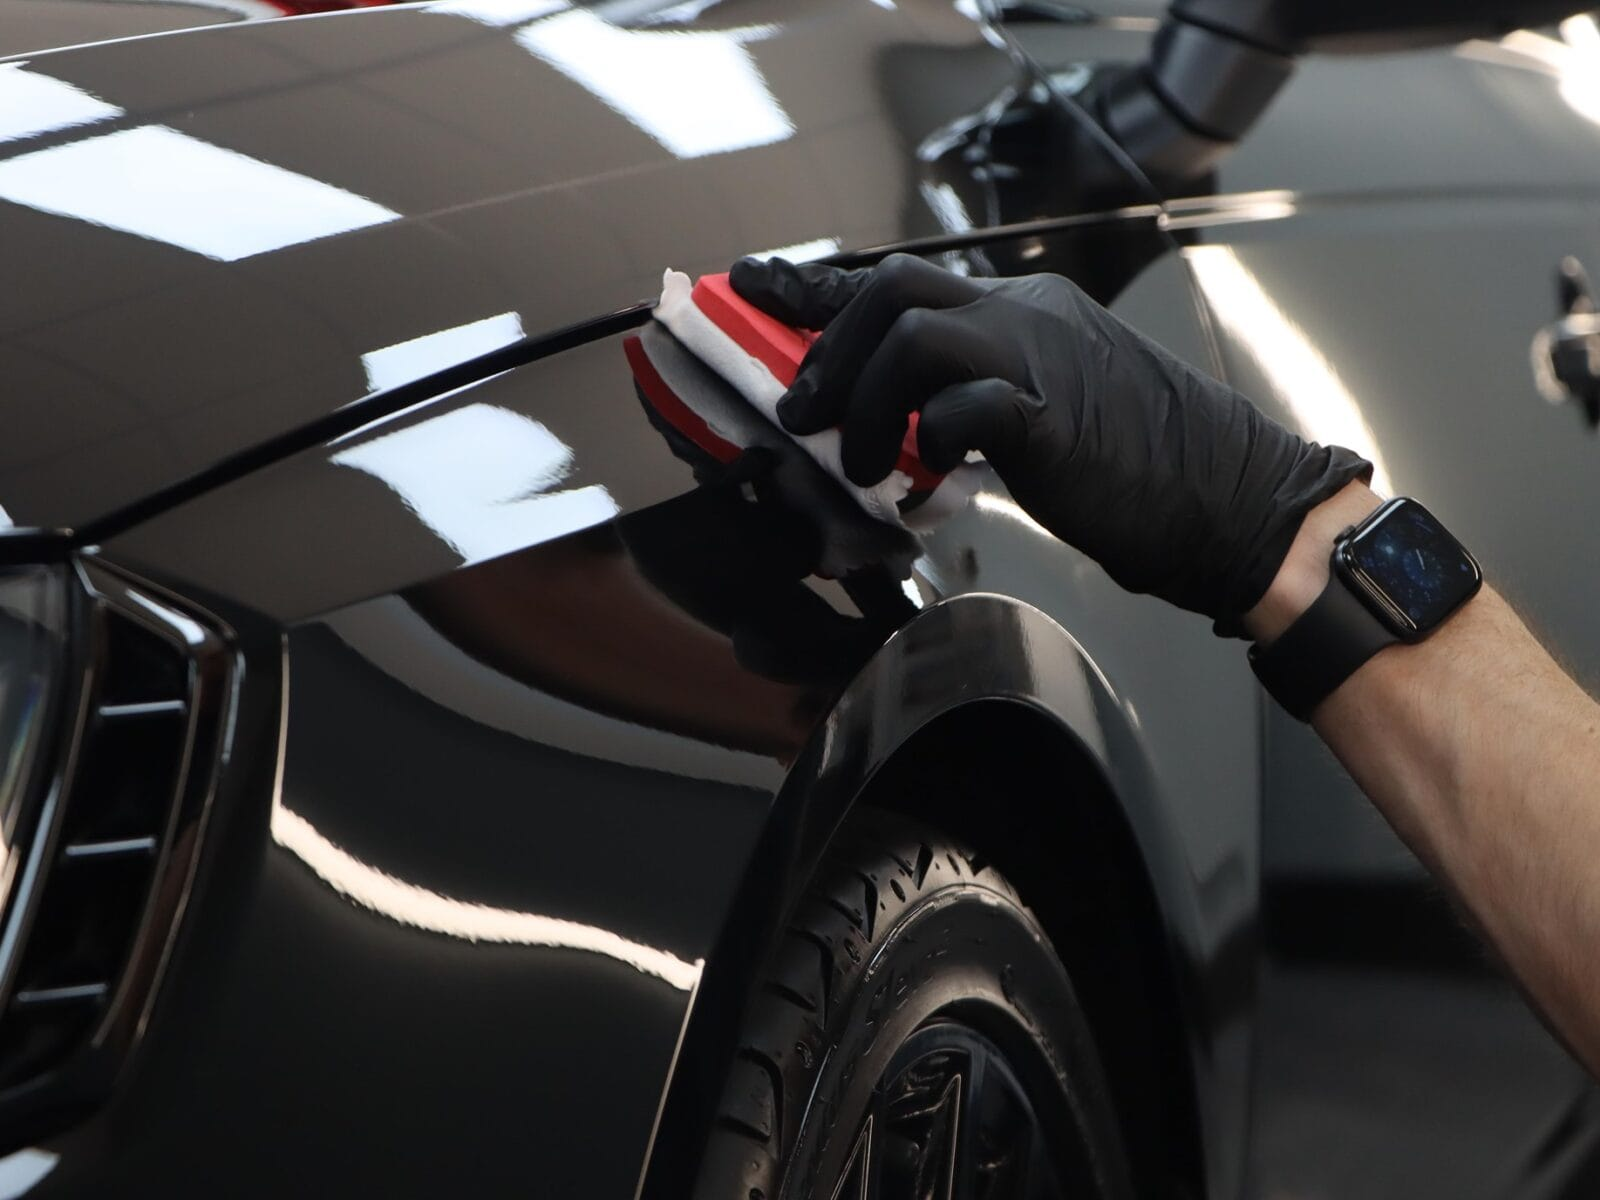 ceramic coating a car